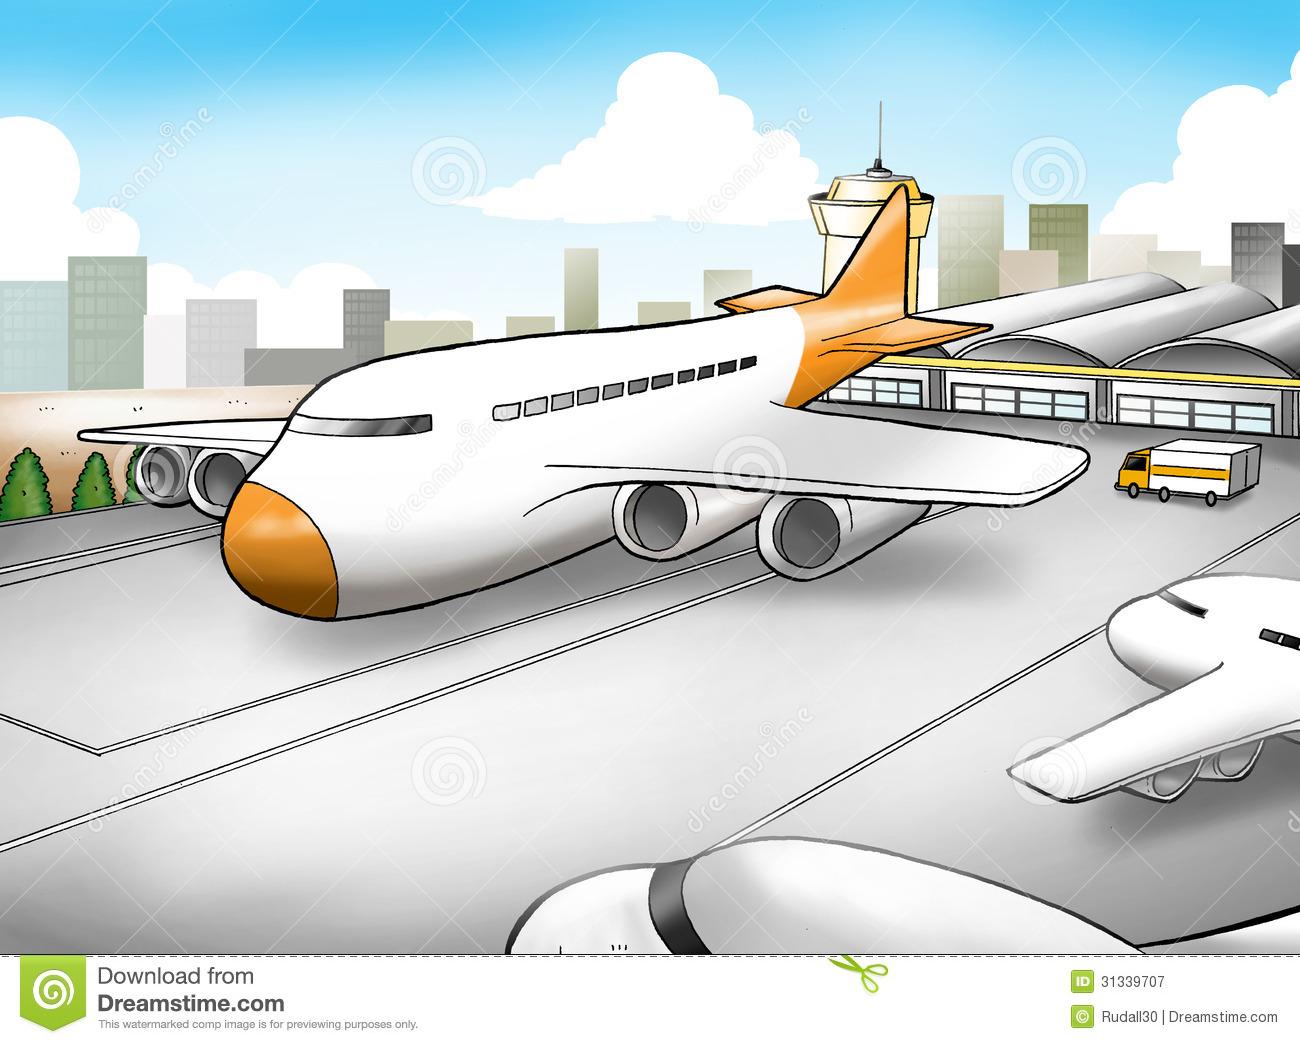 Aircraft clipart airport terminal #5